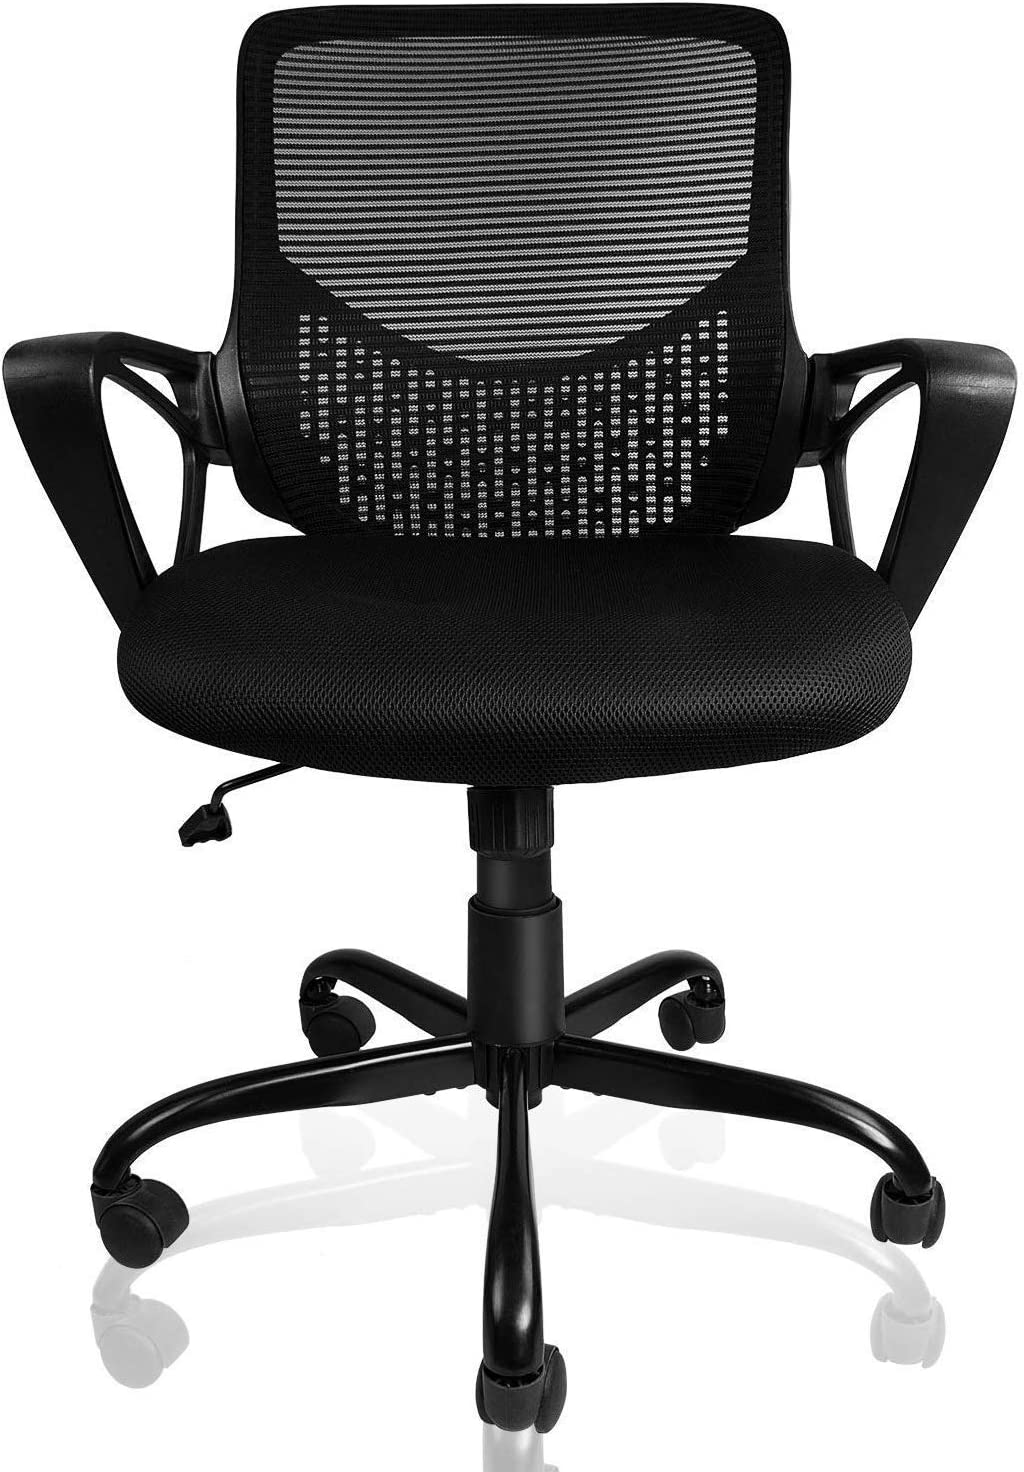 Smugdesk Ergonomic Lumbar Support Office Chair Computer Desk Chair with Armrests, Black